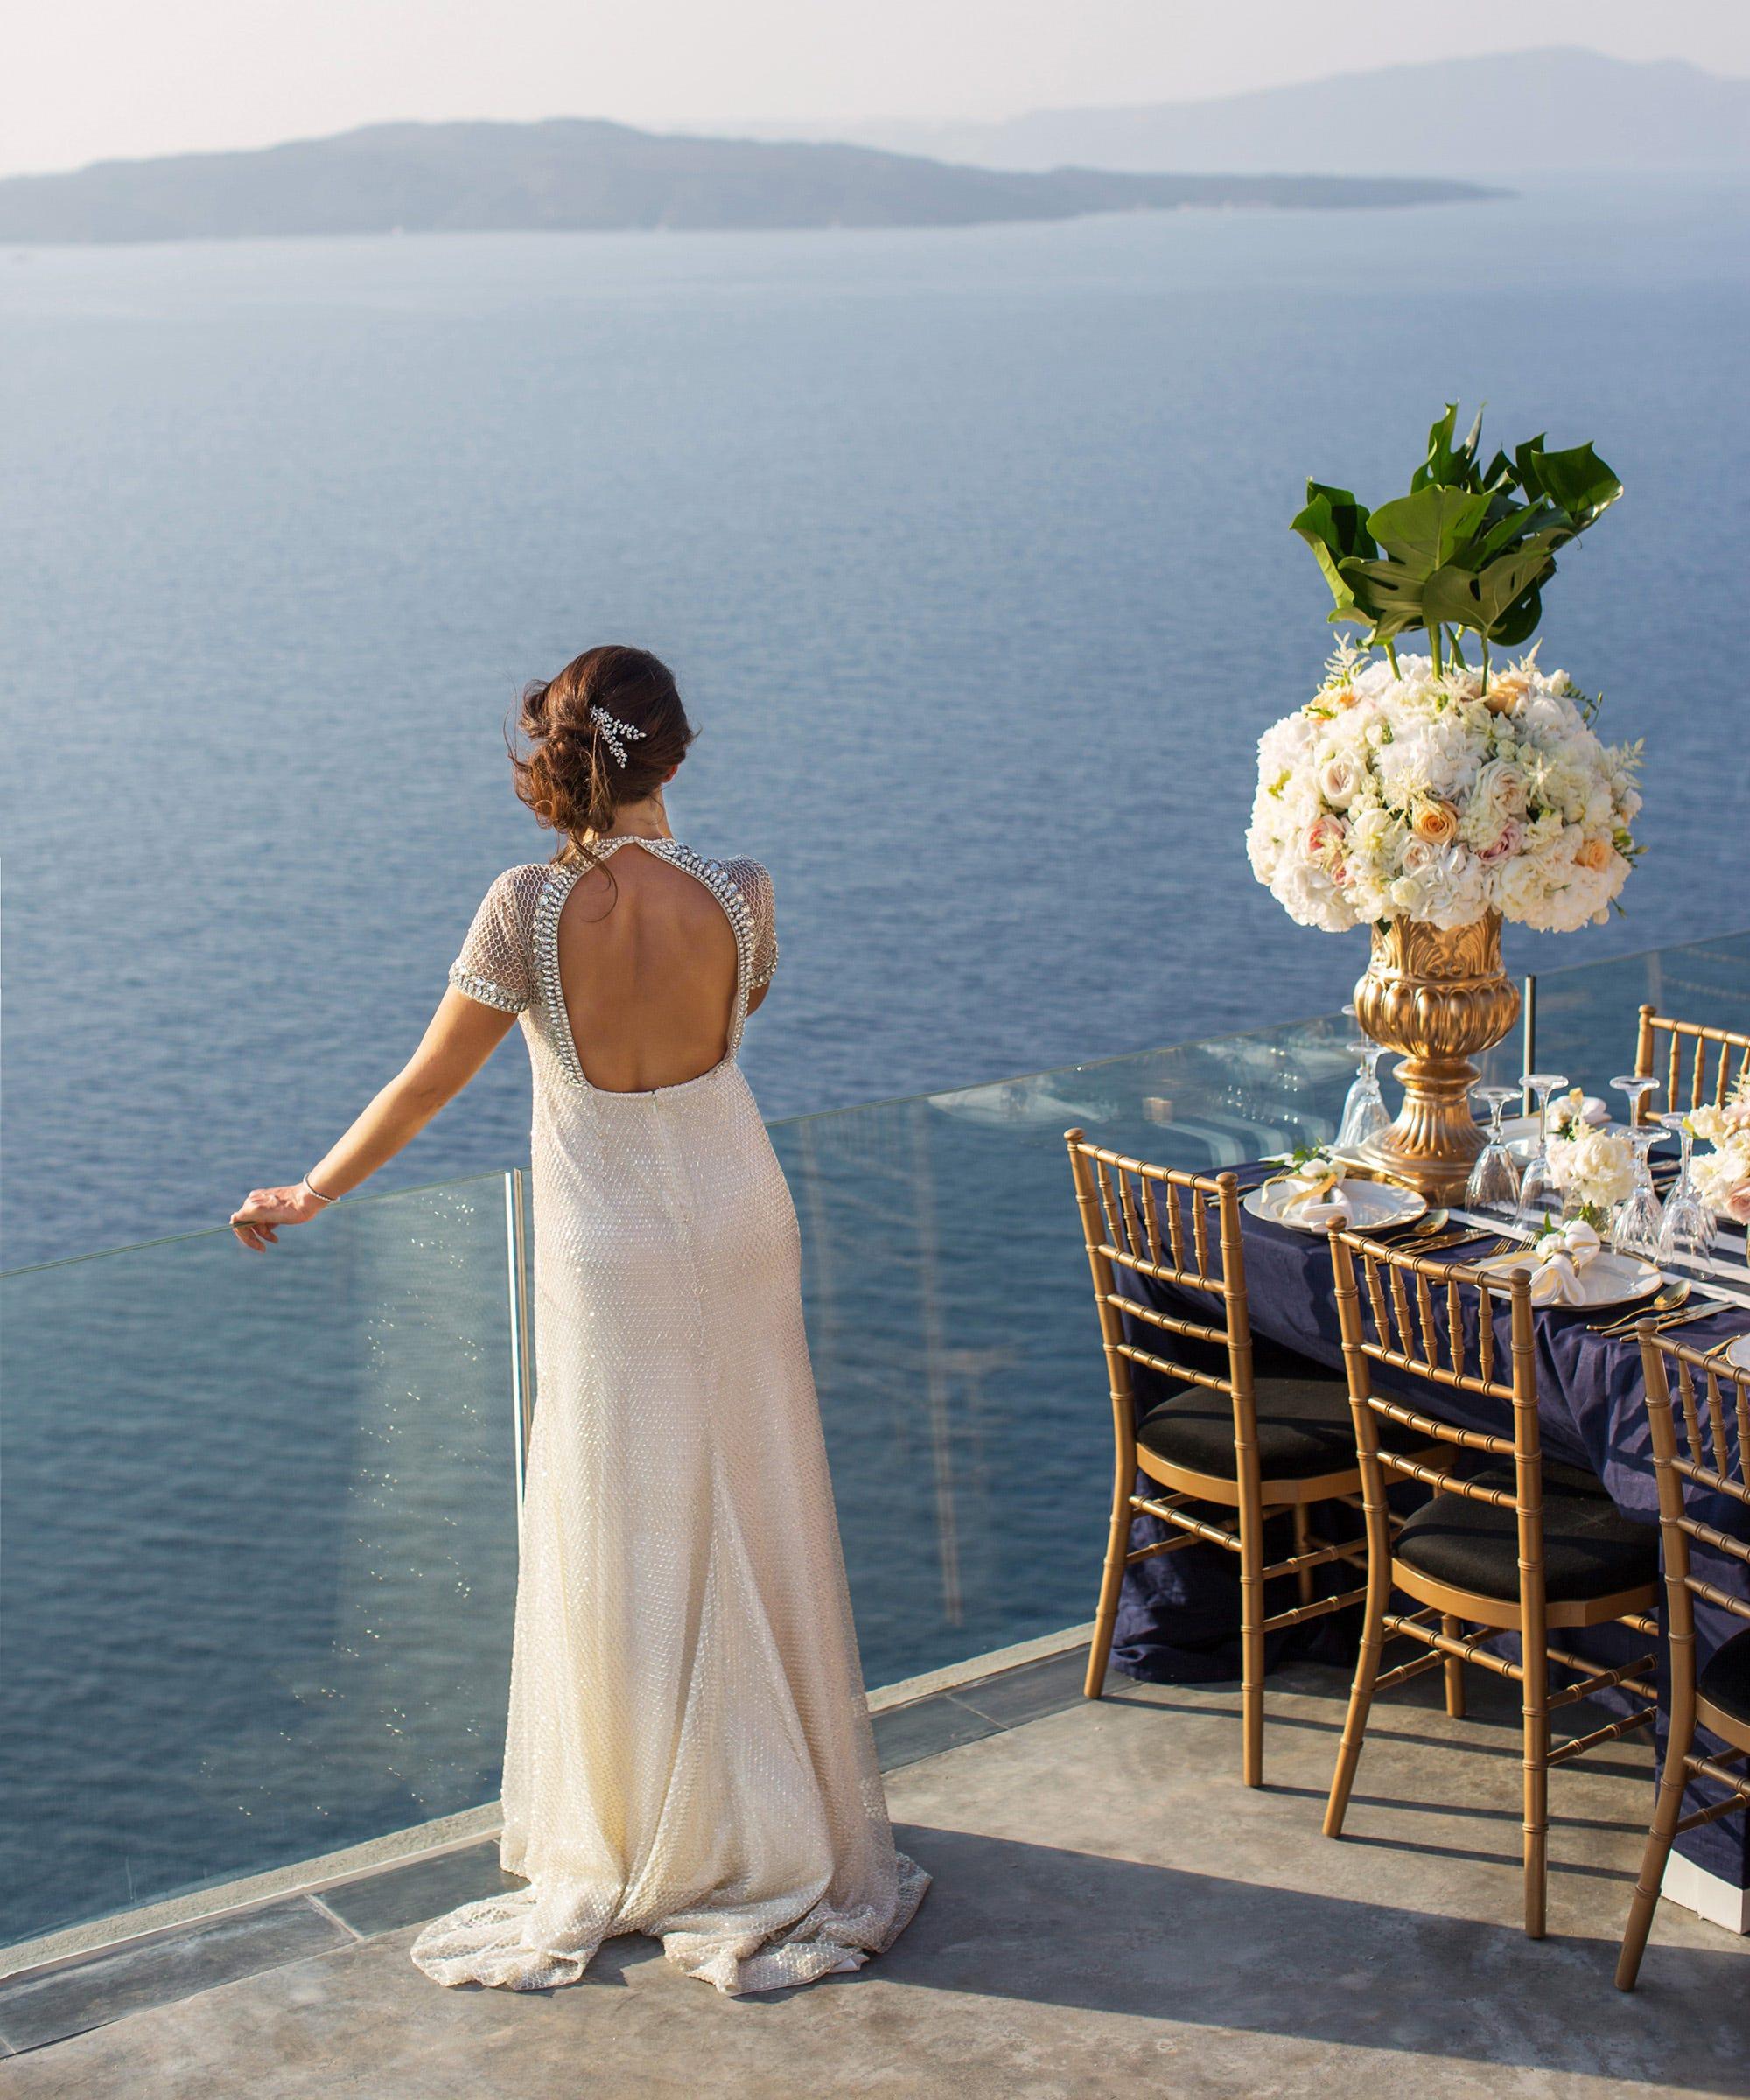 Sofia Crokos Santorini Greece Wedding Pictures